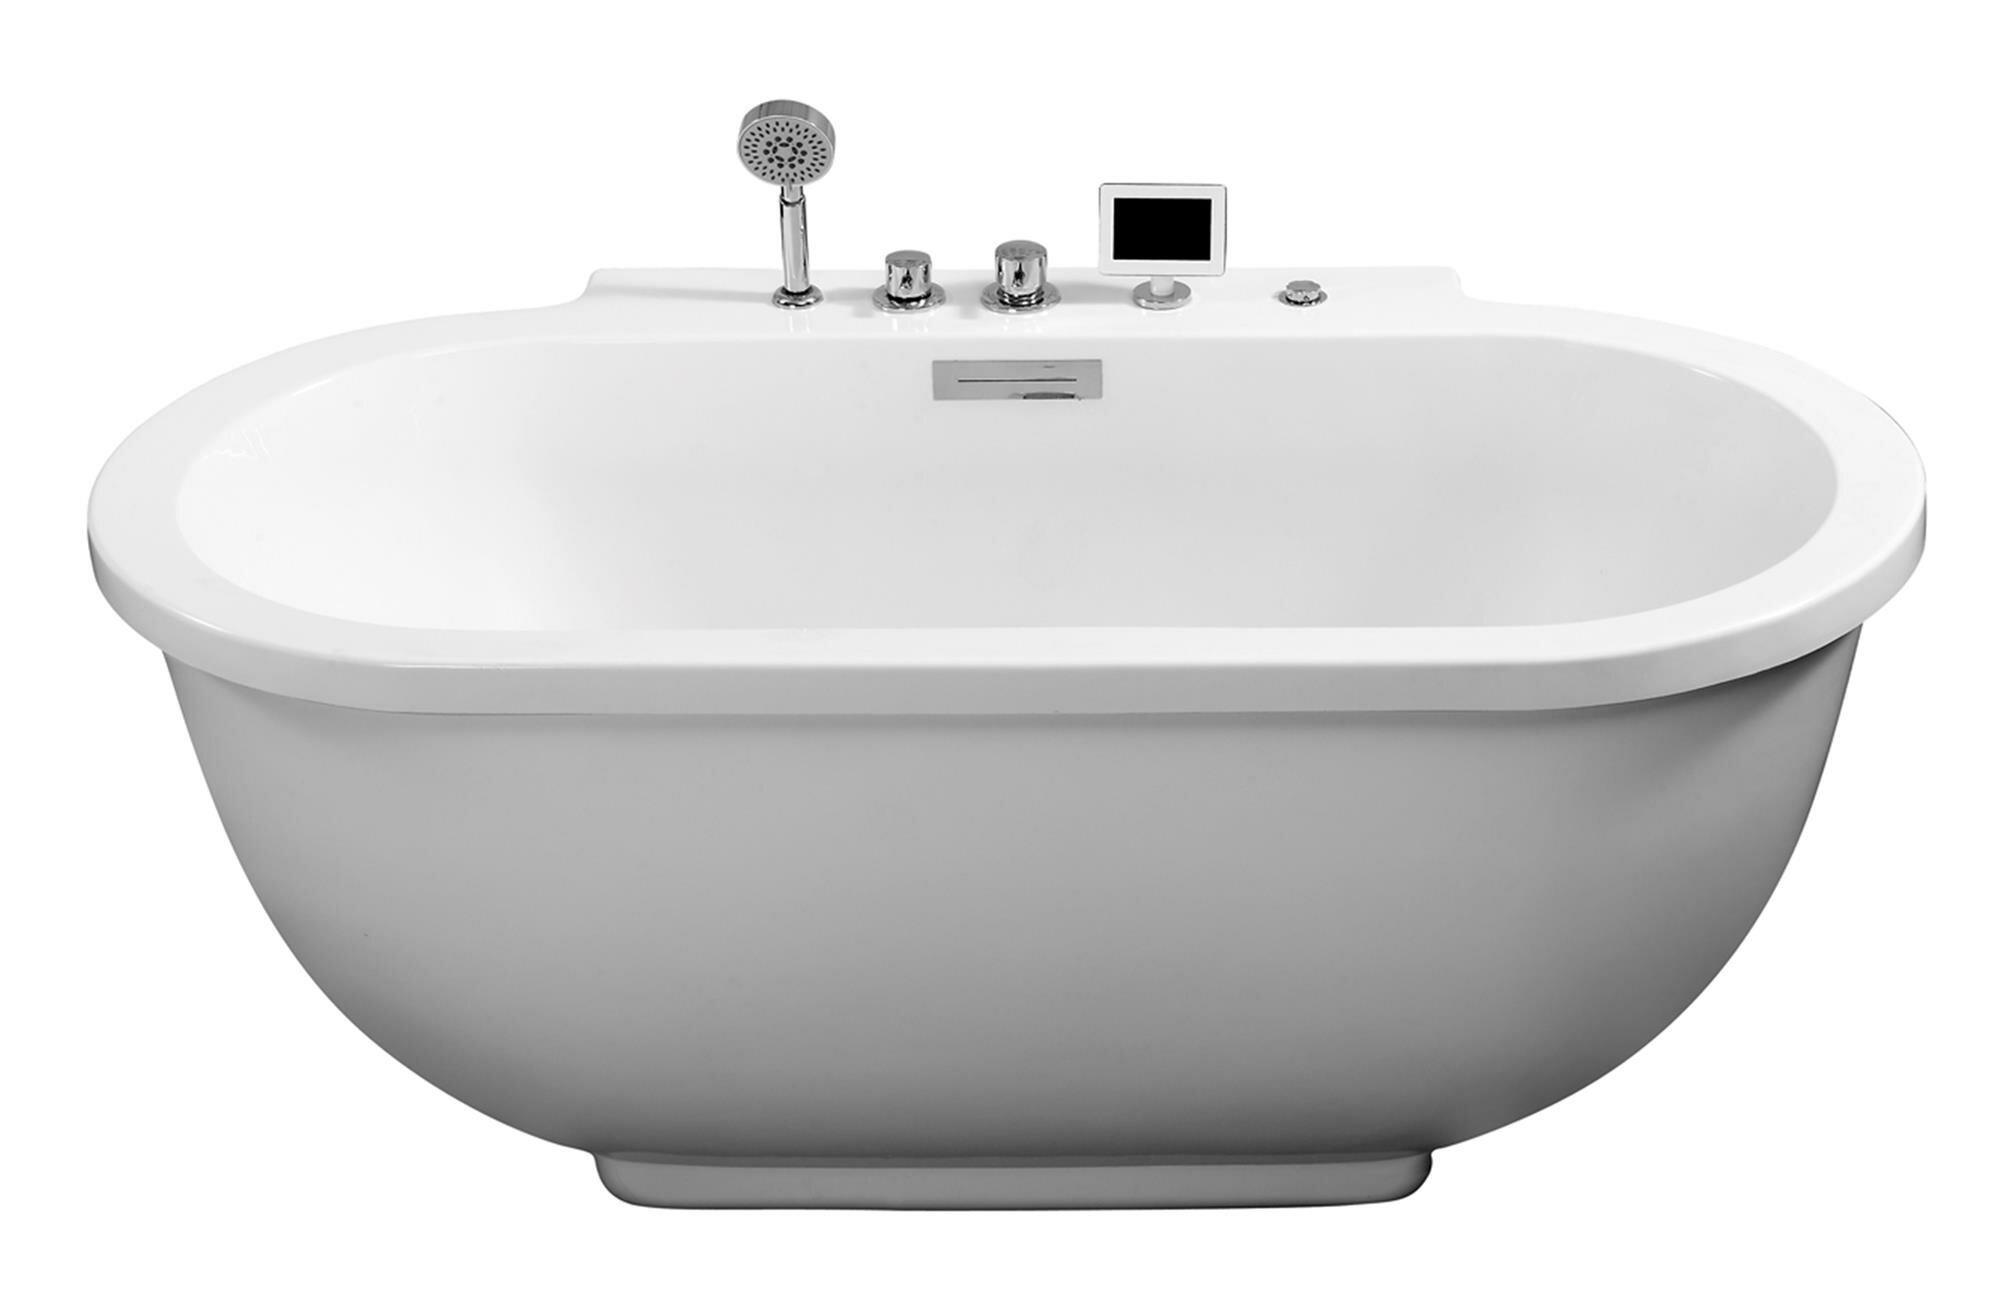 whirlpool freestanding canada lowe lh bathtub standing free milla semi tubs industries acrylic bathtubs tub tec s acri